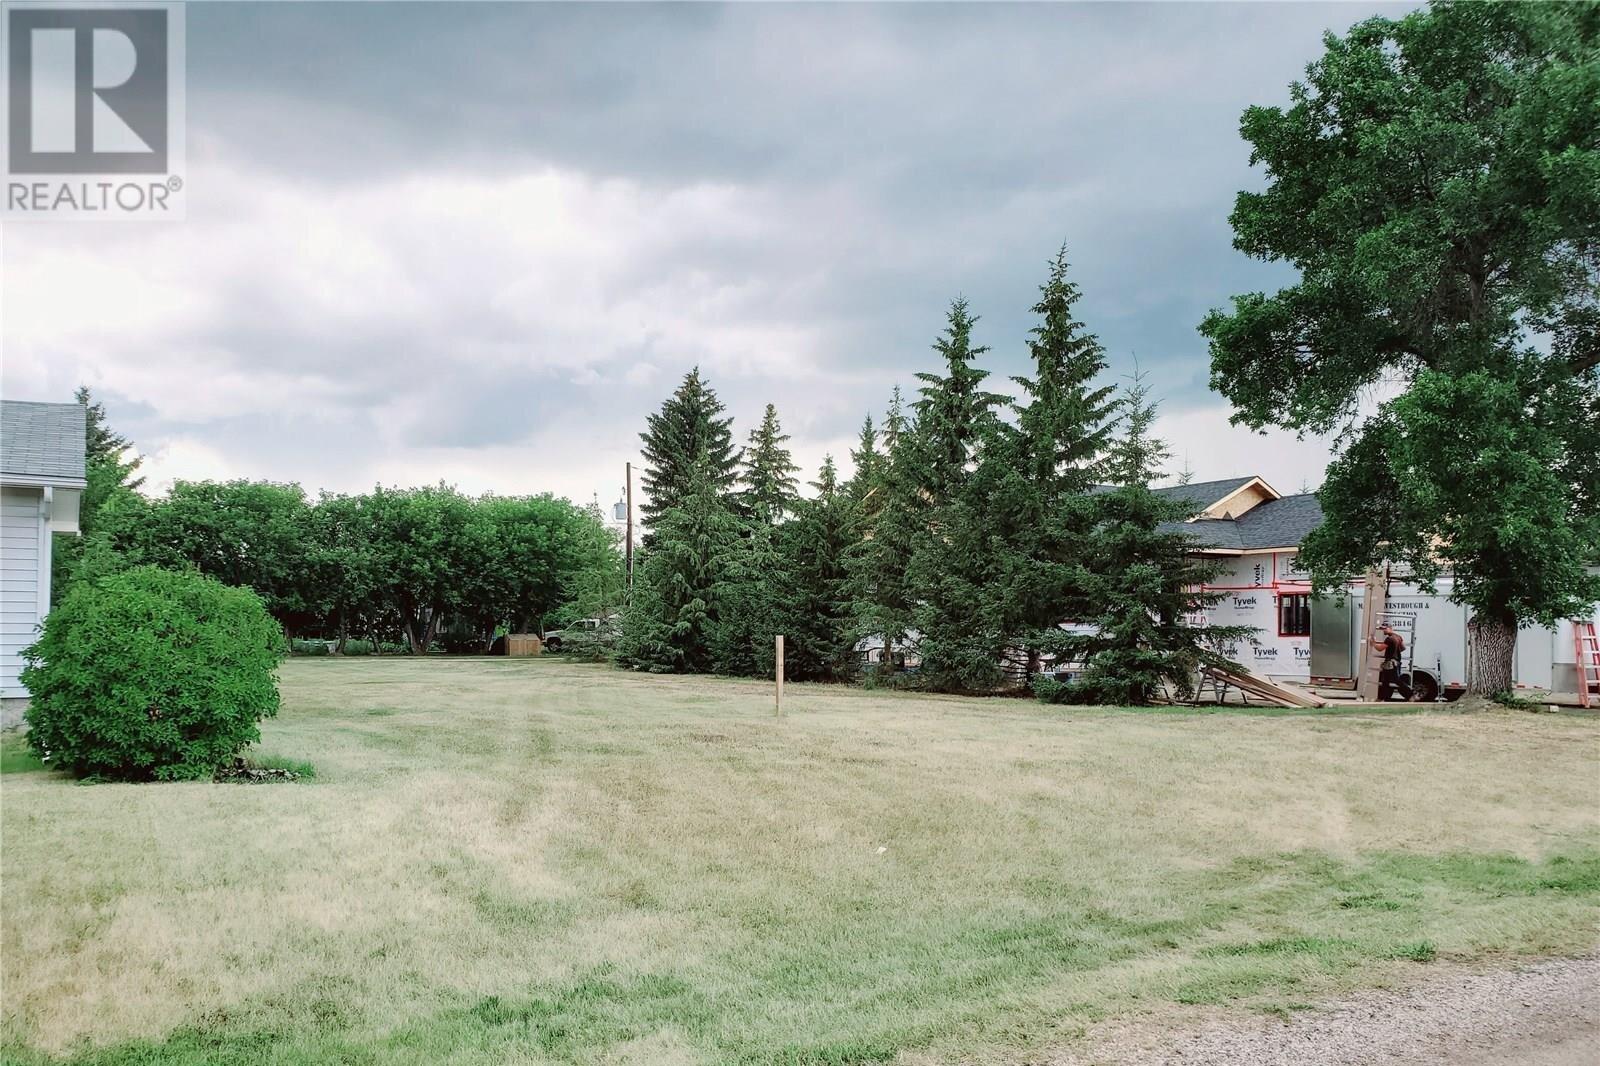 Home for sale at 644 Pasqua Ave S Fort Qu'appelle Saskatchewan - MLS: SK819607